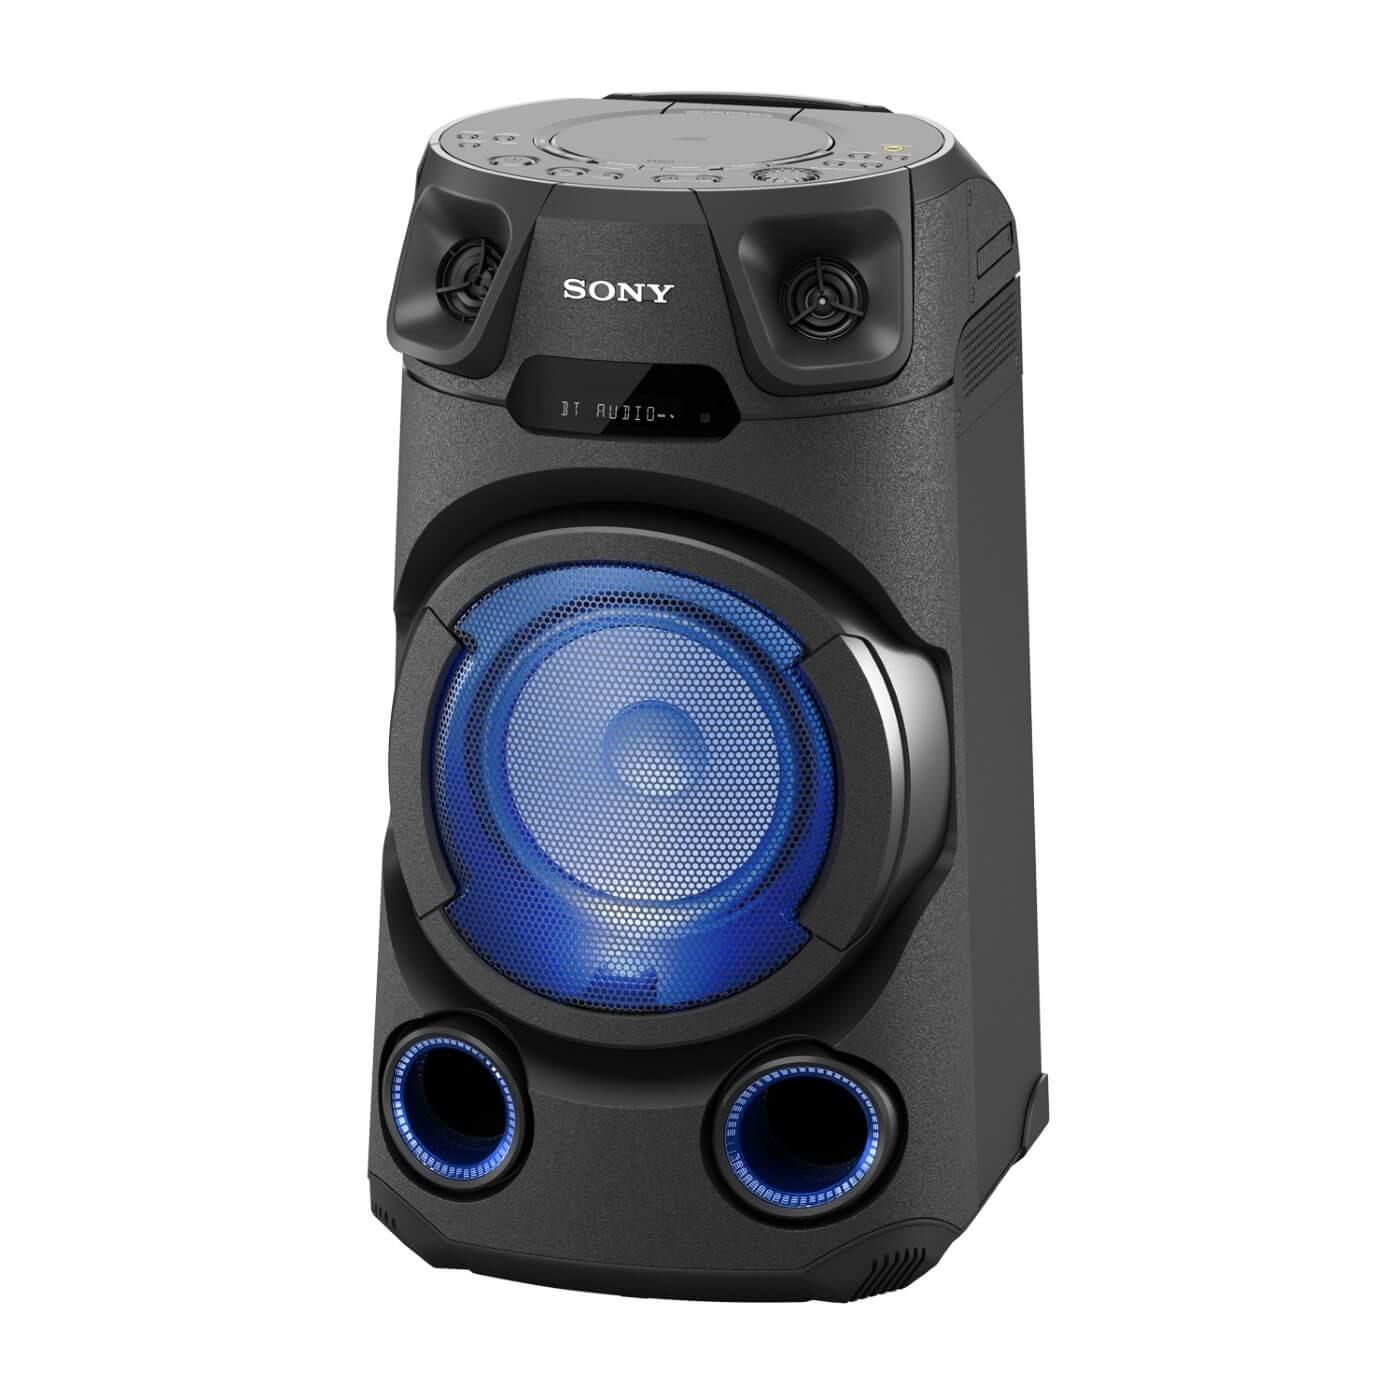 MHC-V13D аудиосистема Sony